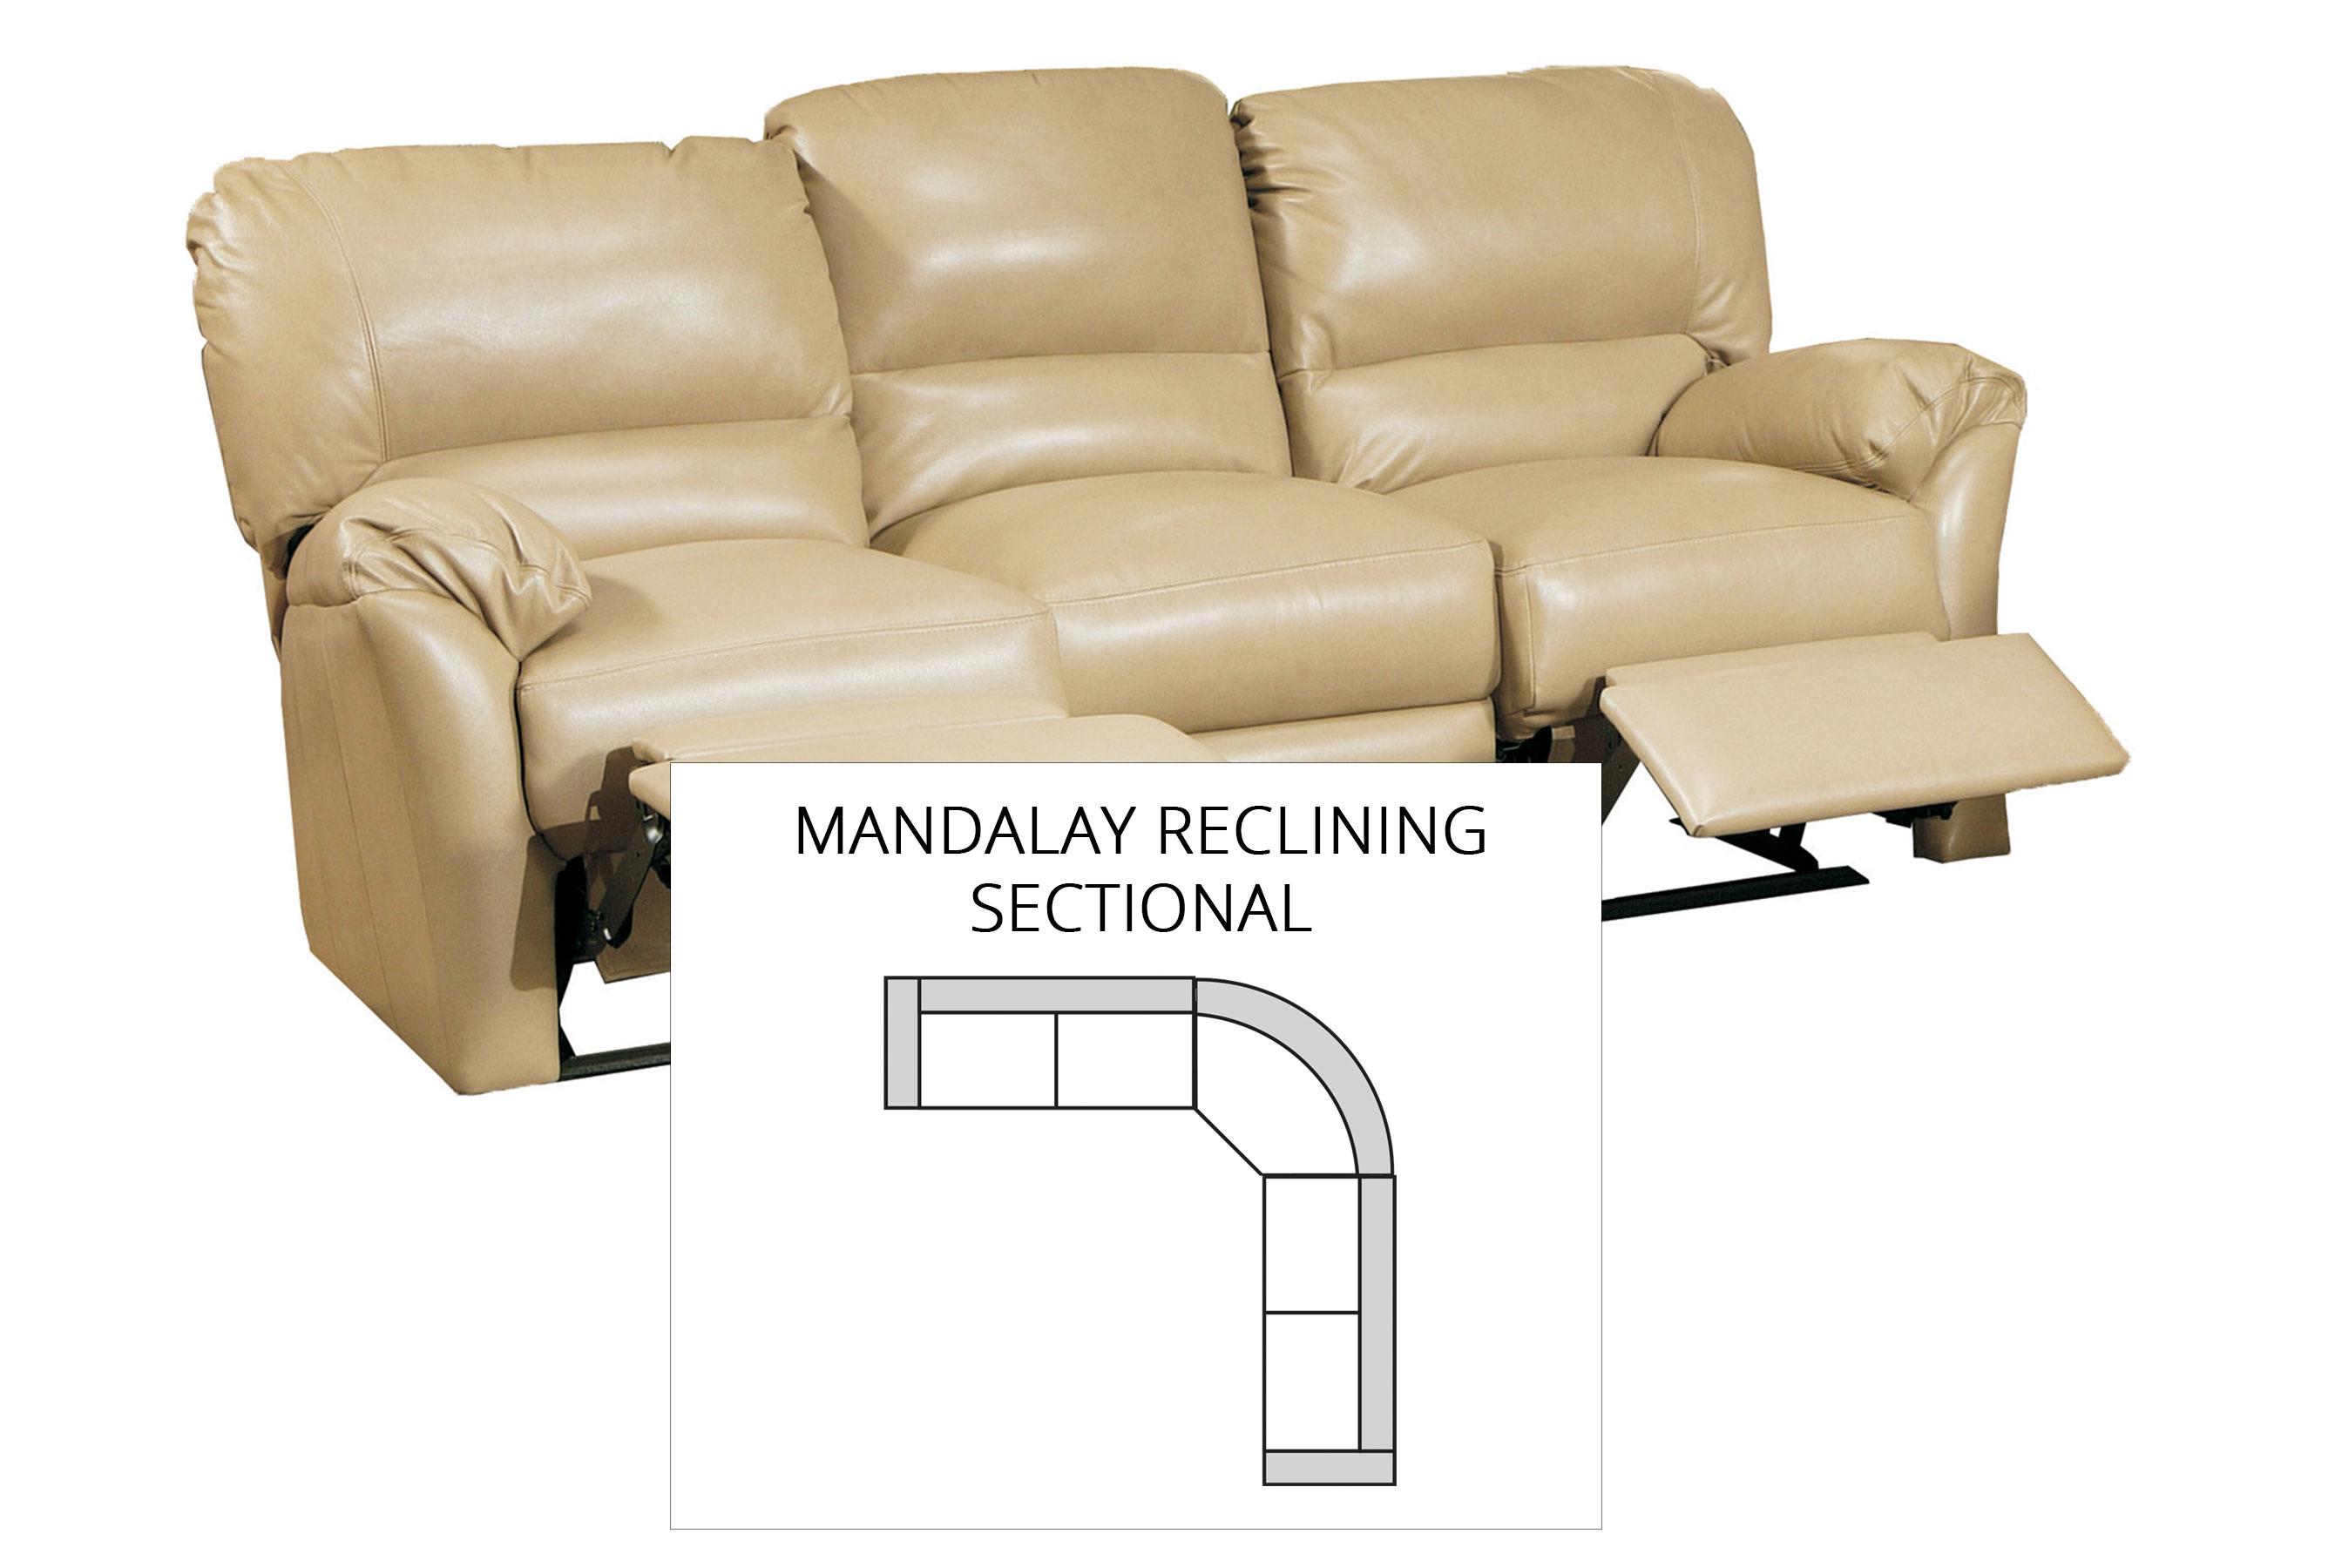 Mandalay Reclining Sectional All